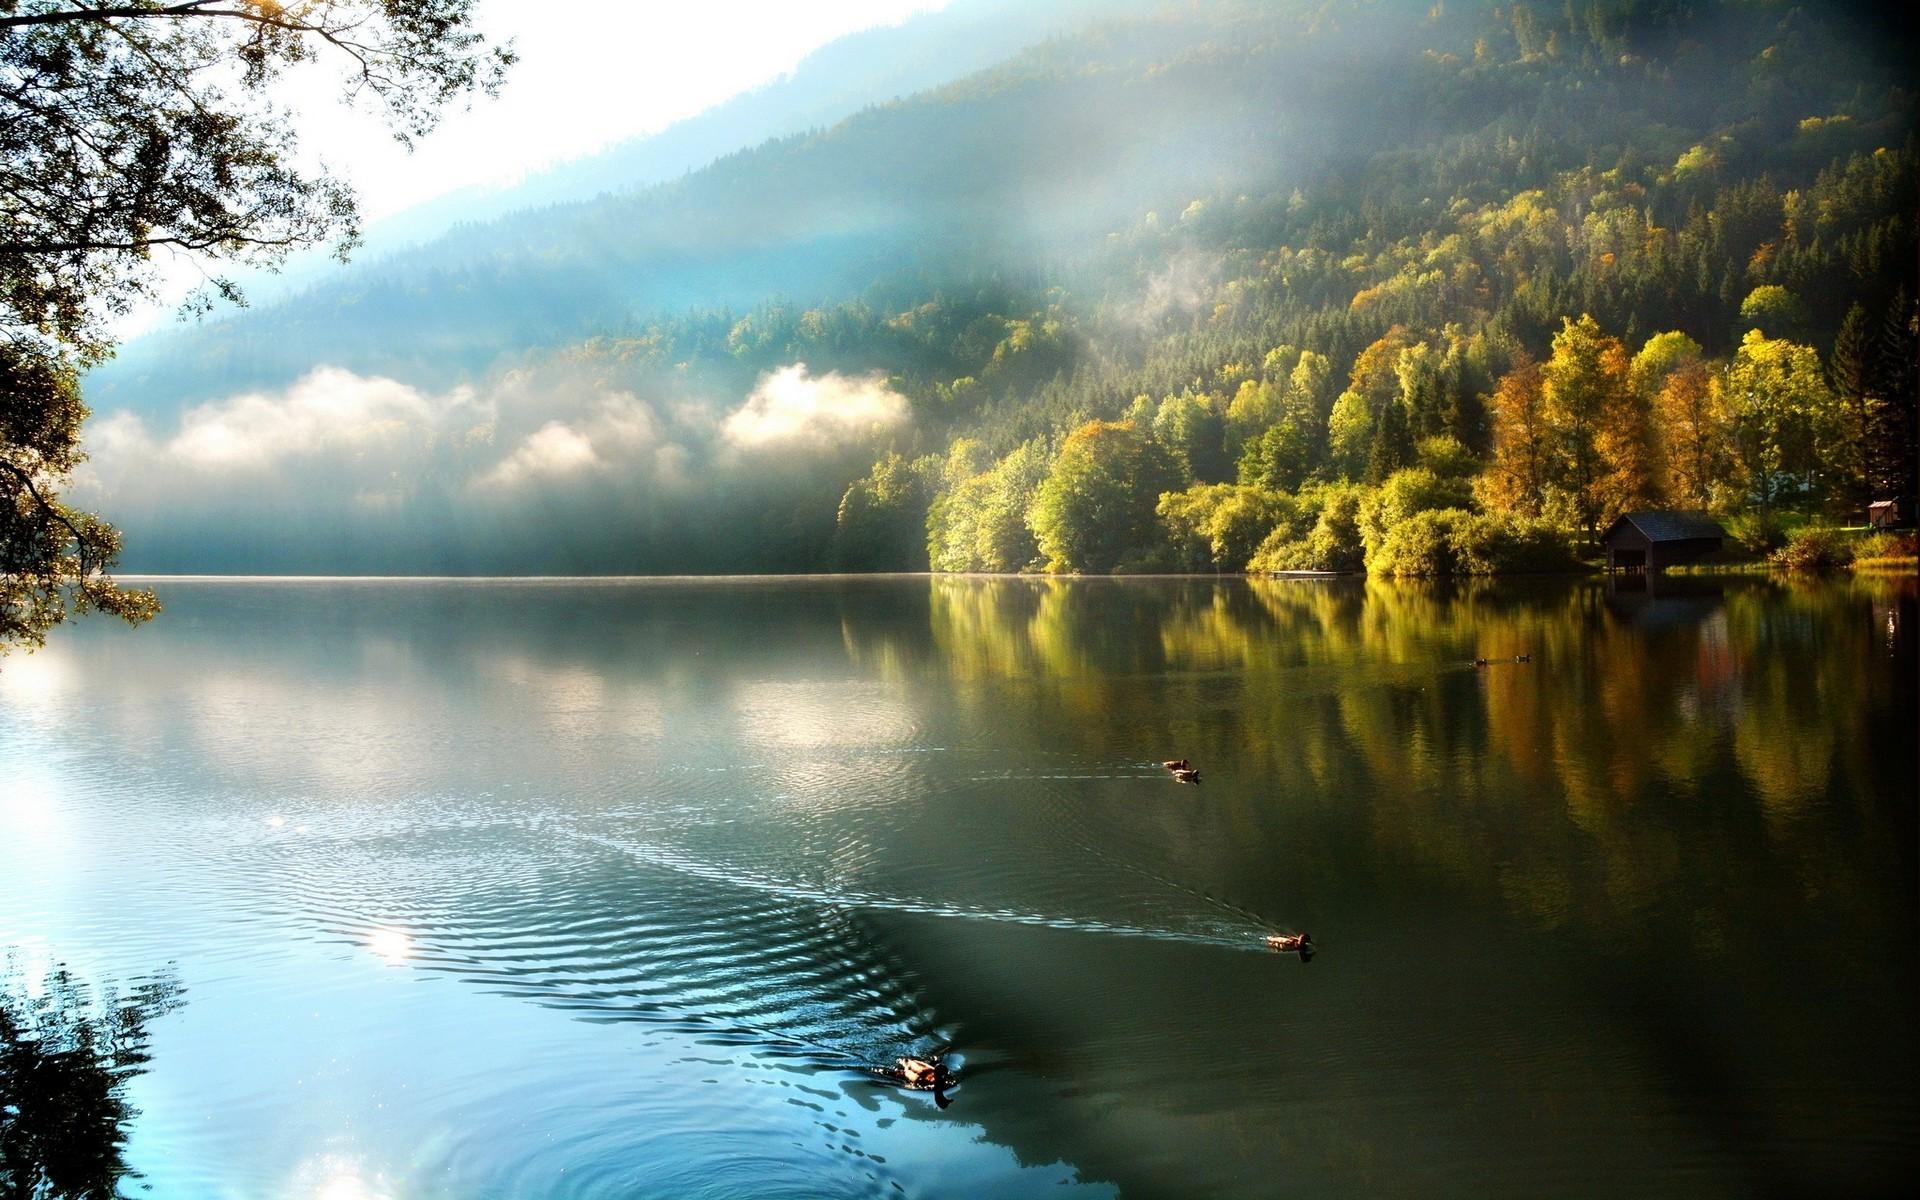 Full Screen Desktop Fall Wallpaper Fall Lake Nature Trees Mist Clouds Duck Water